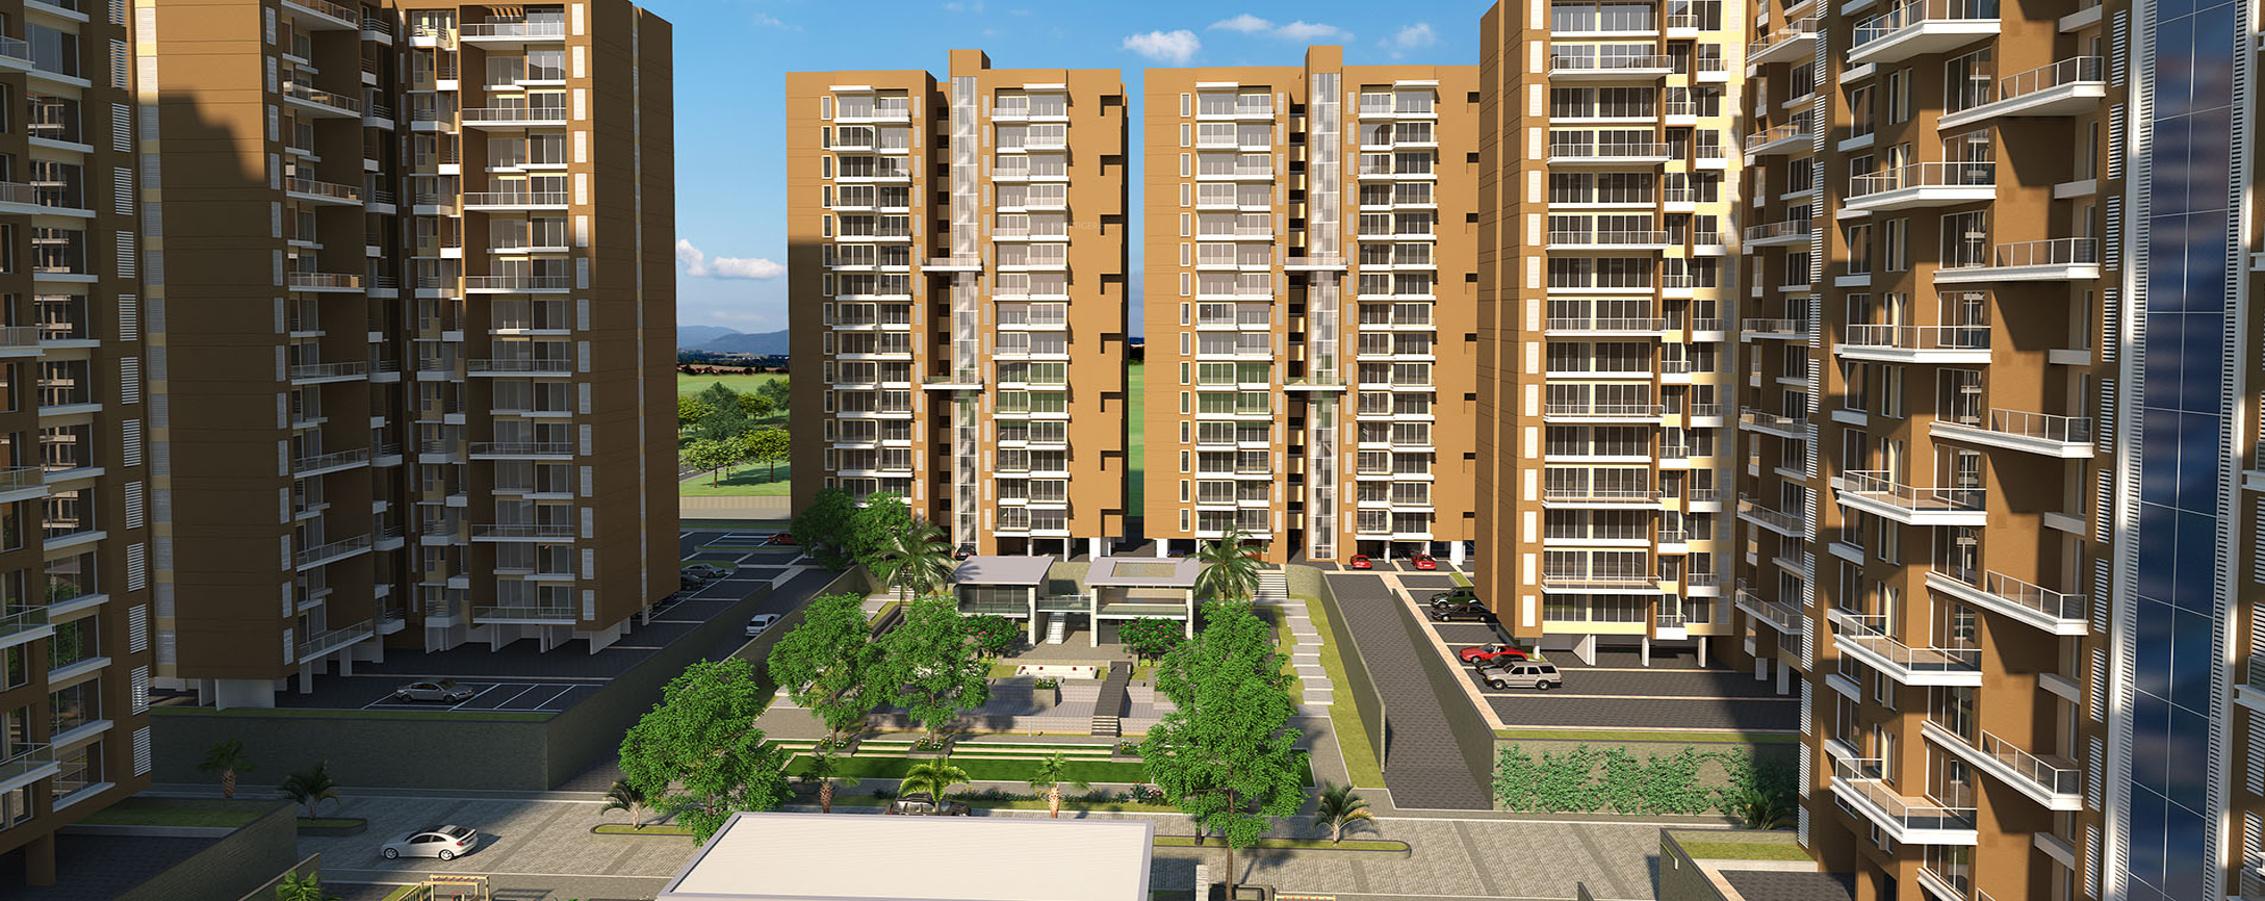 1150 Sq Ft 2 Bhk 2t Apartment For Sale In Goel Ganga